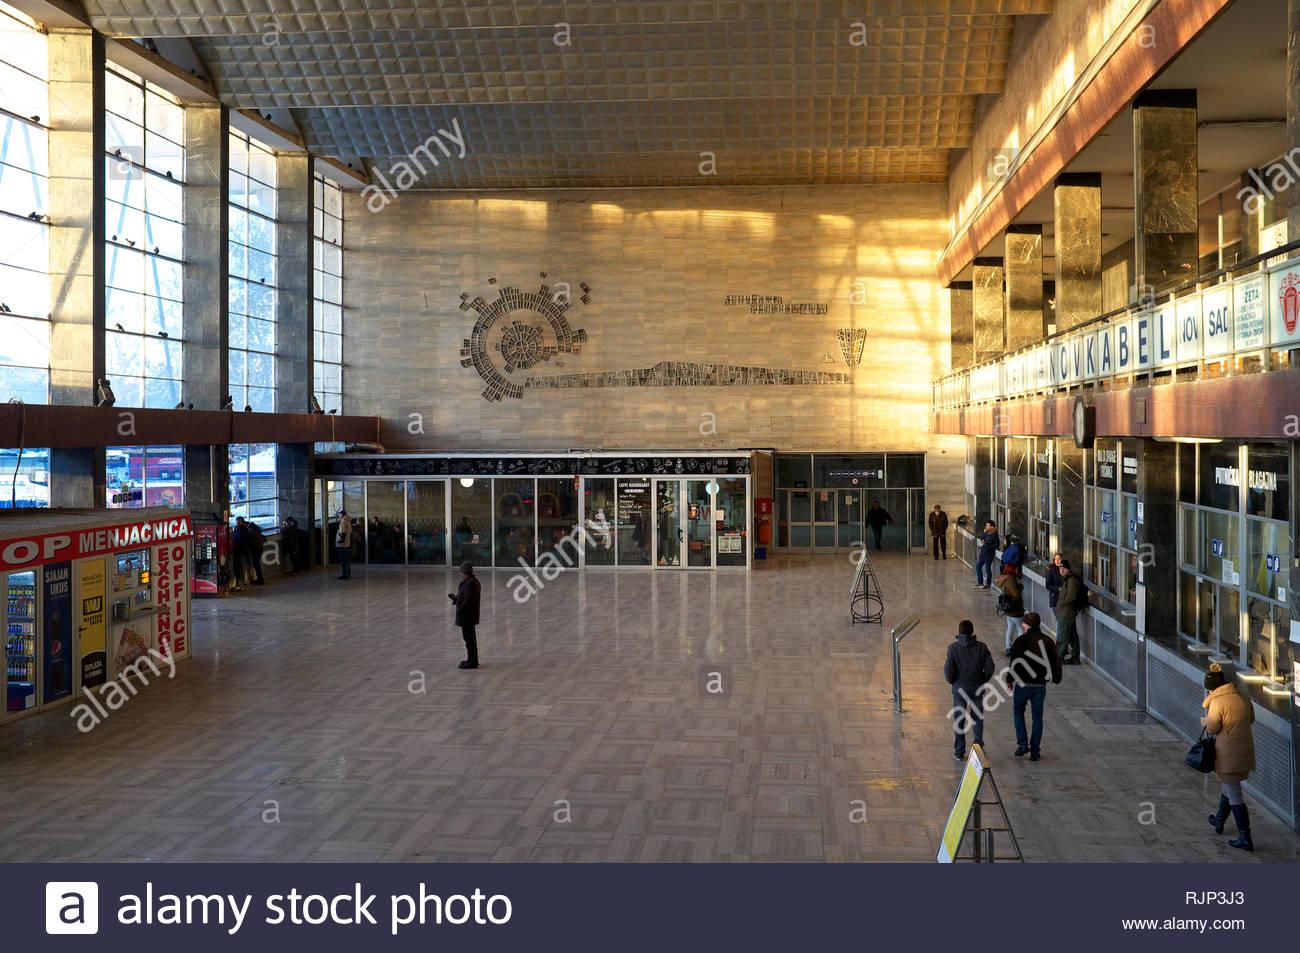 The booking hall of Novi Sad railway station. City of Novi Sad, Vojvodina, Serbia. Stock Photo